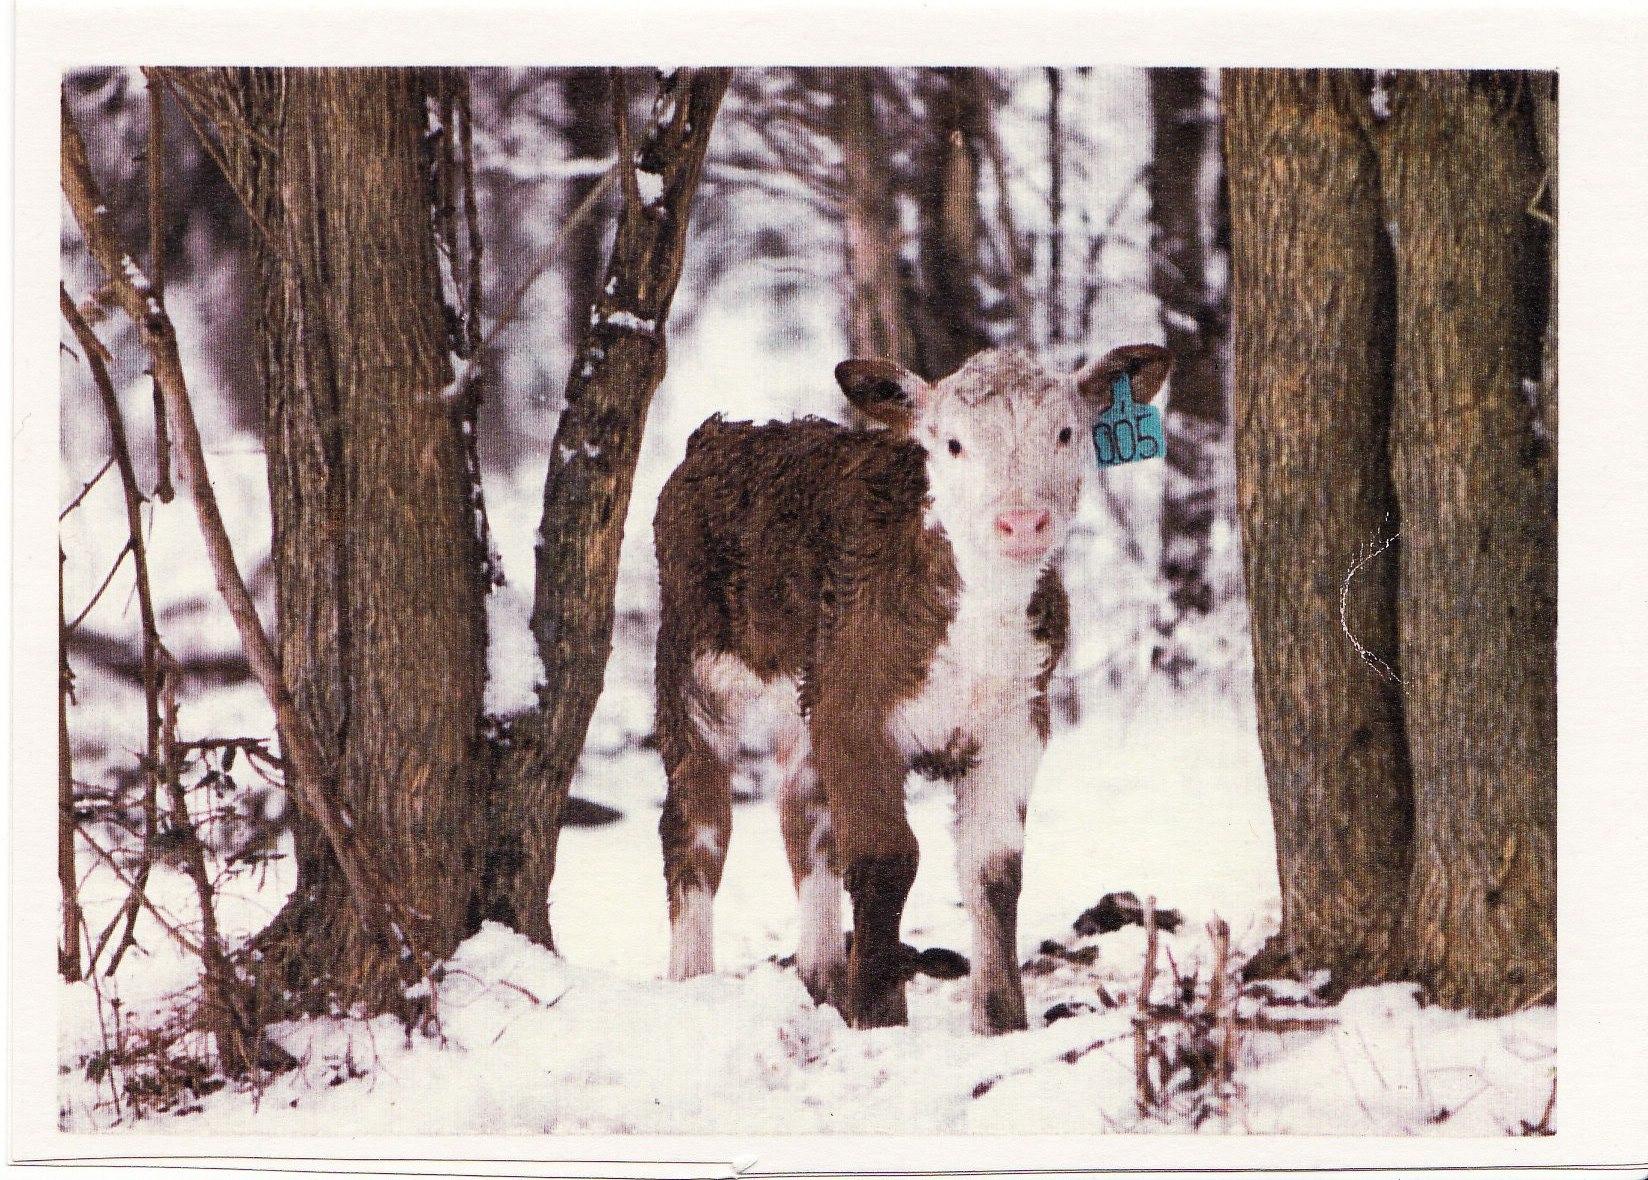 Coley Christmas card 1980